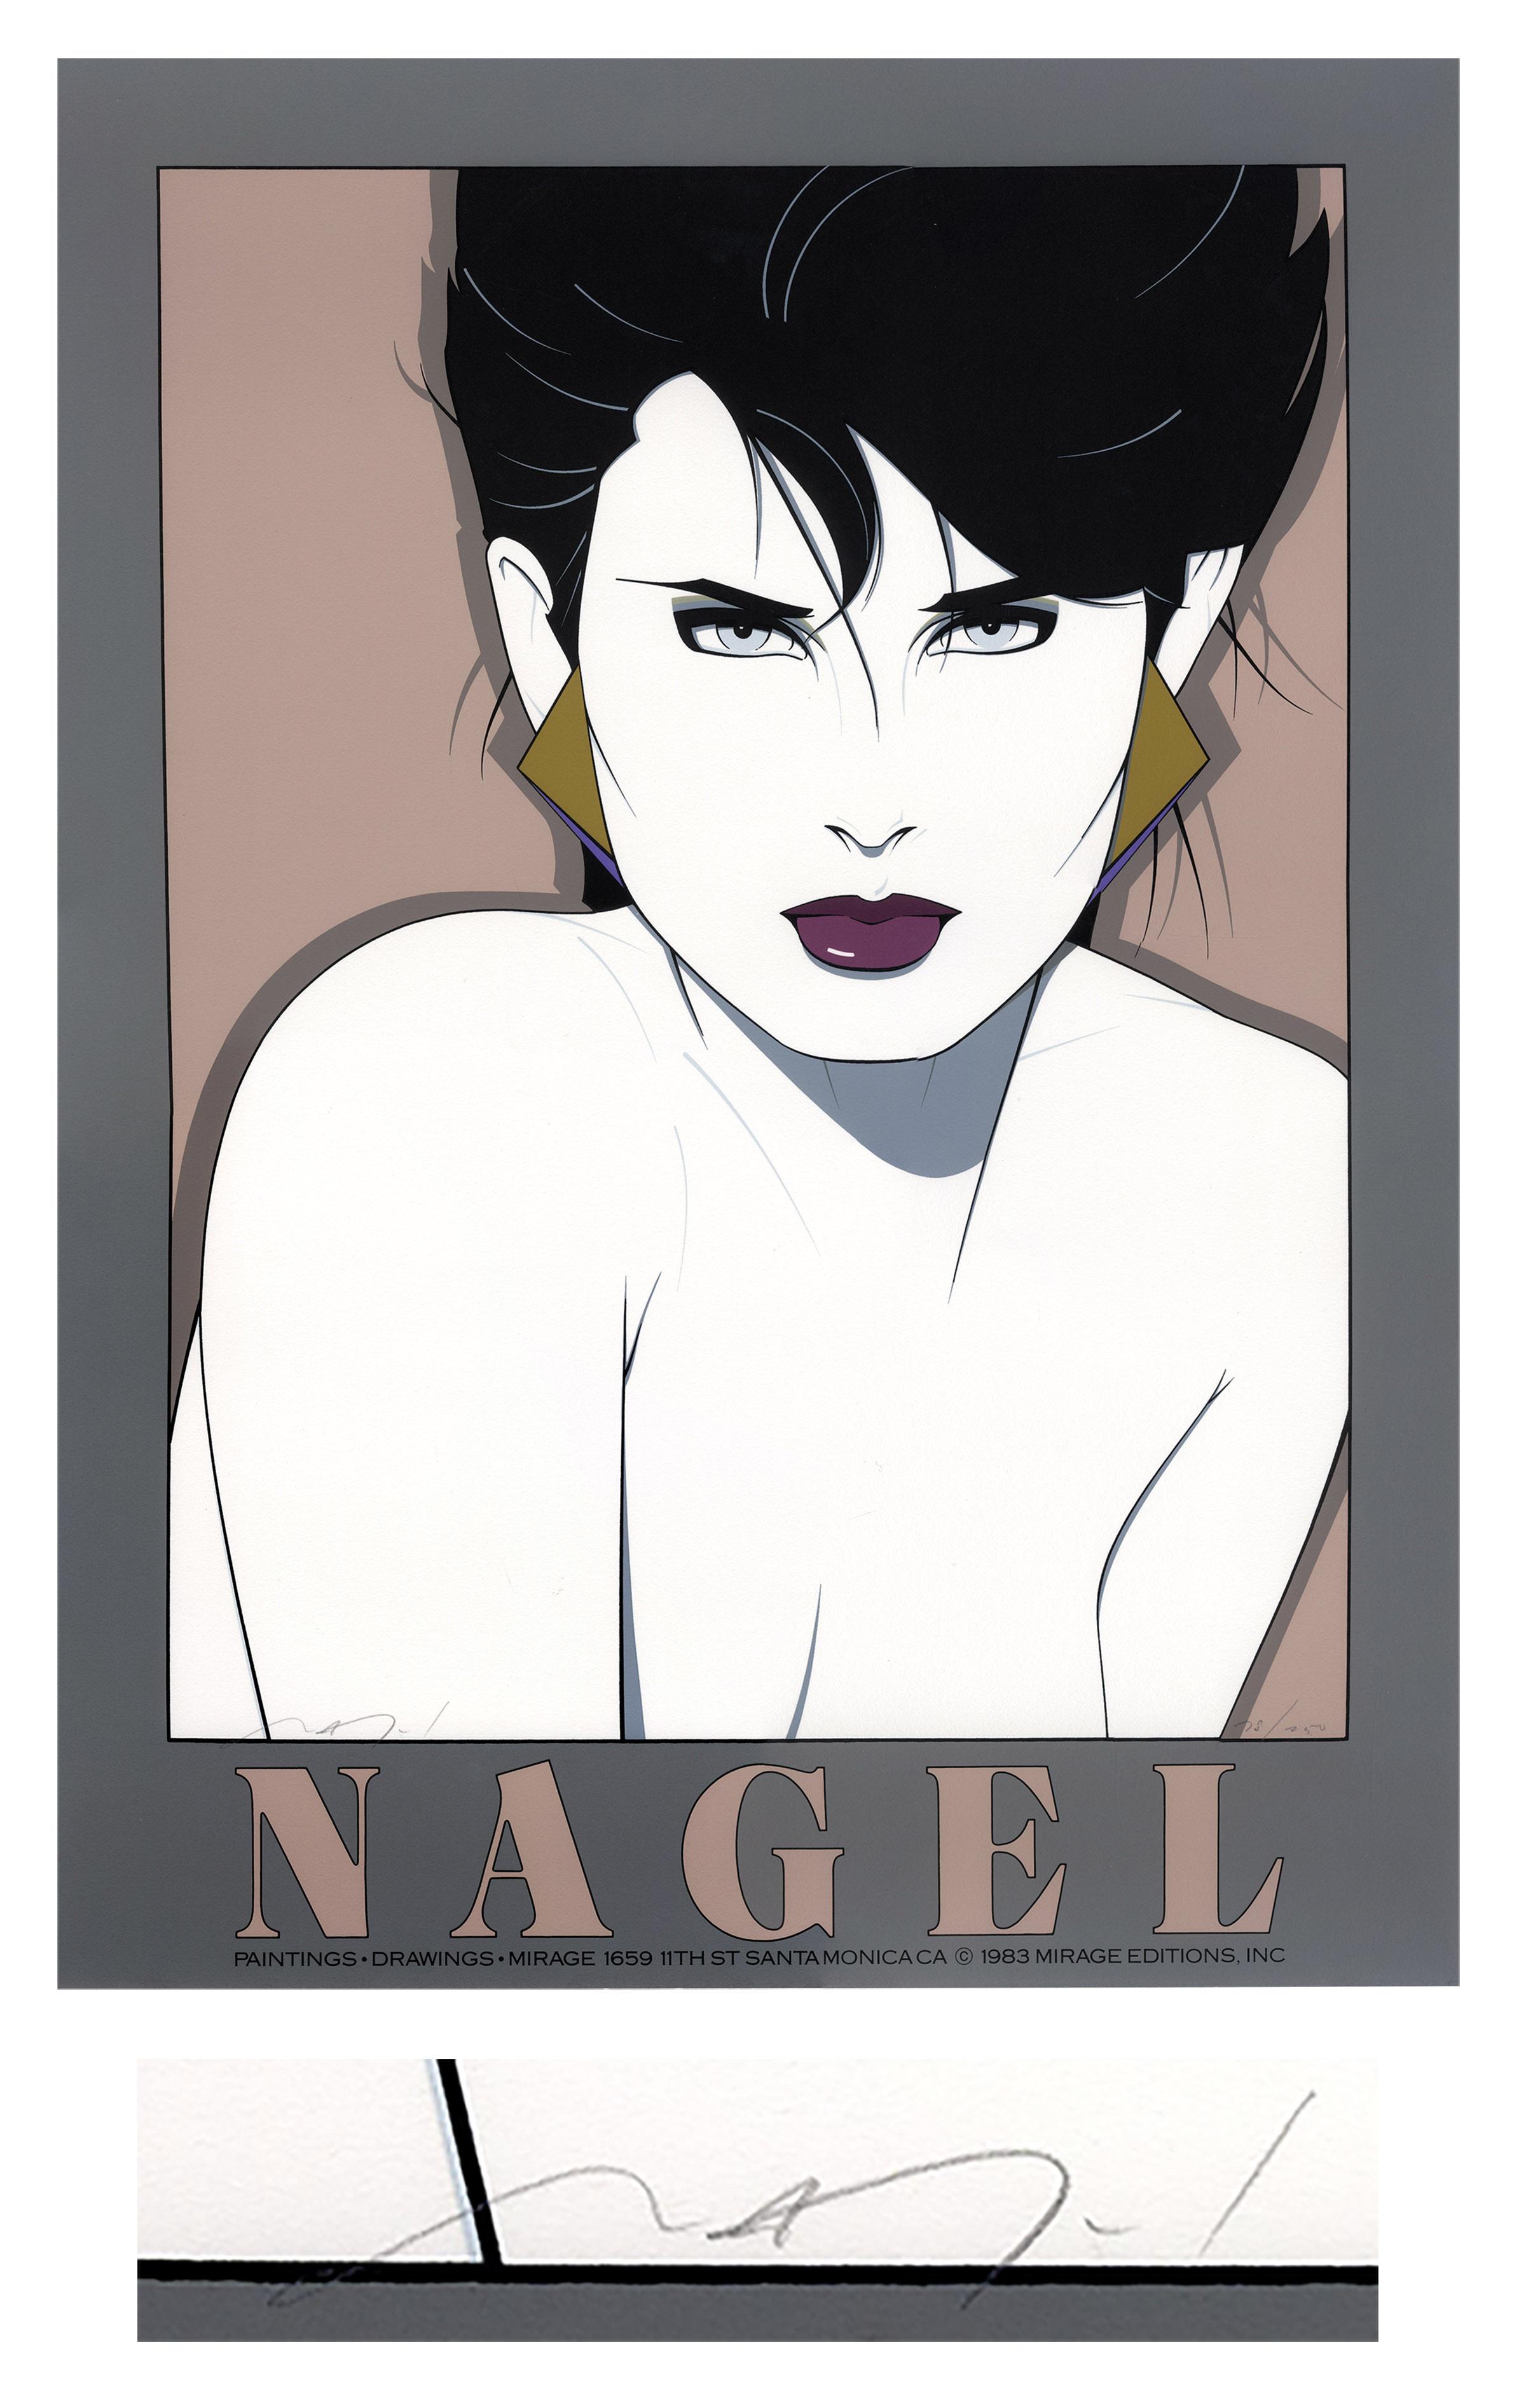 Niedlich Nagel Bilder - Nagellack-Design-Ideen - glennbasso.com